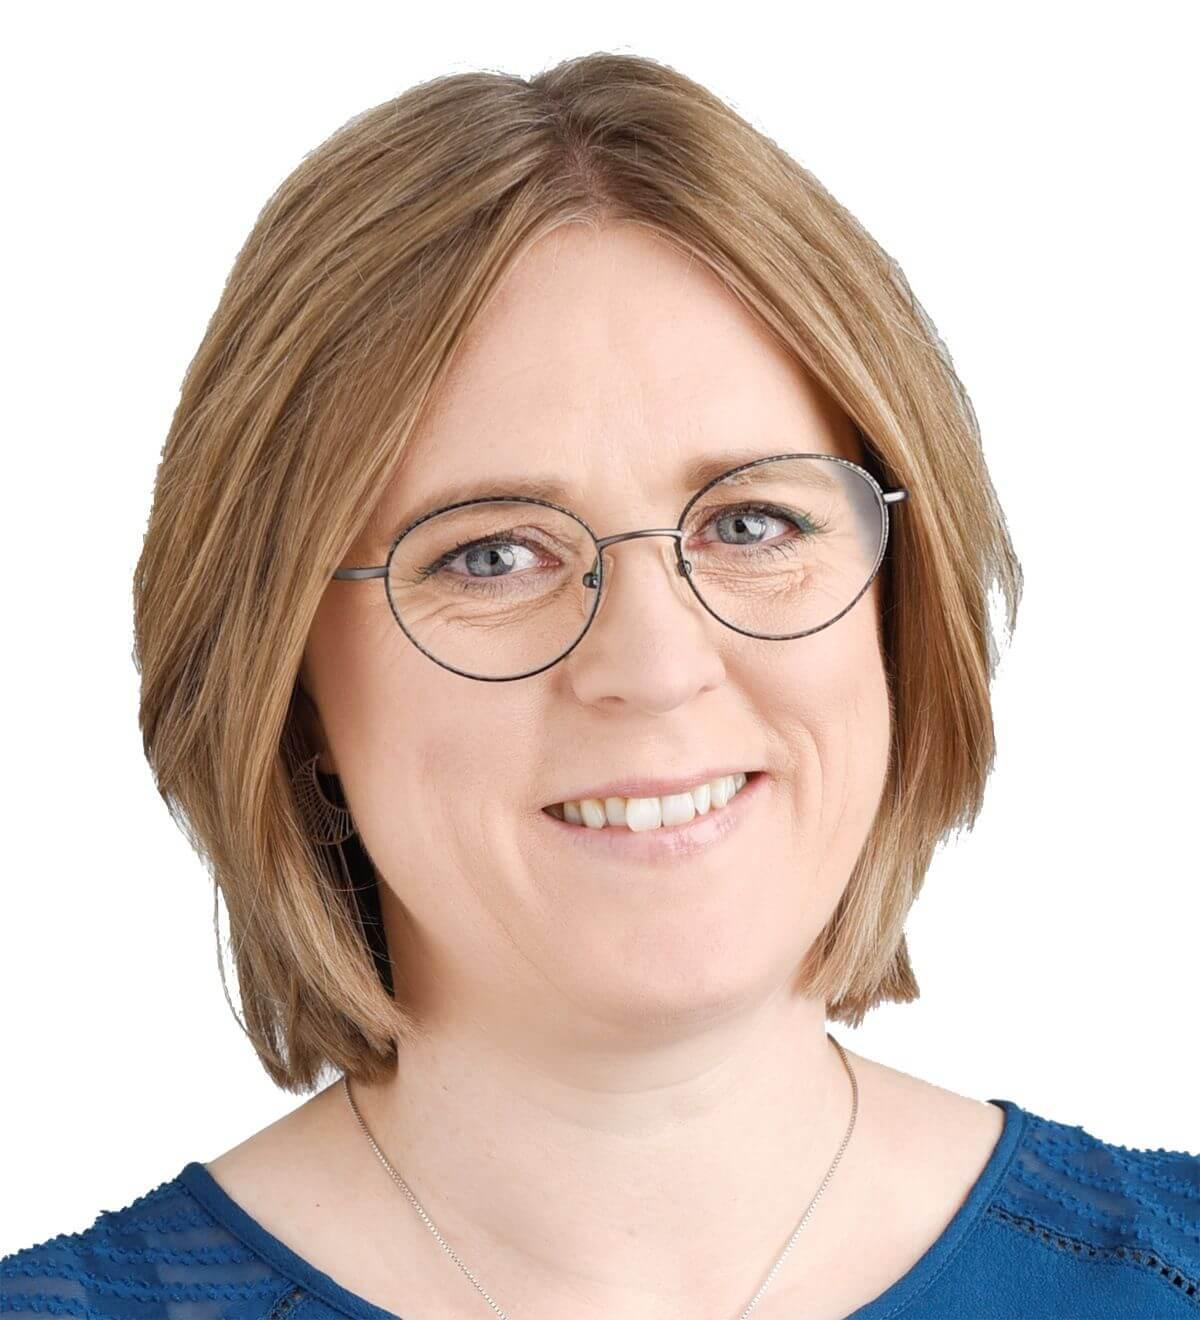 Psykoterapeut og parterapeut Stine Zink i Århus